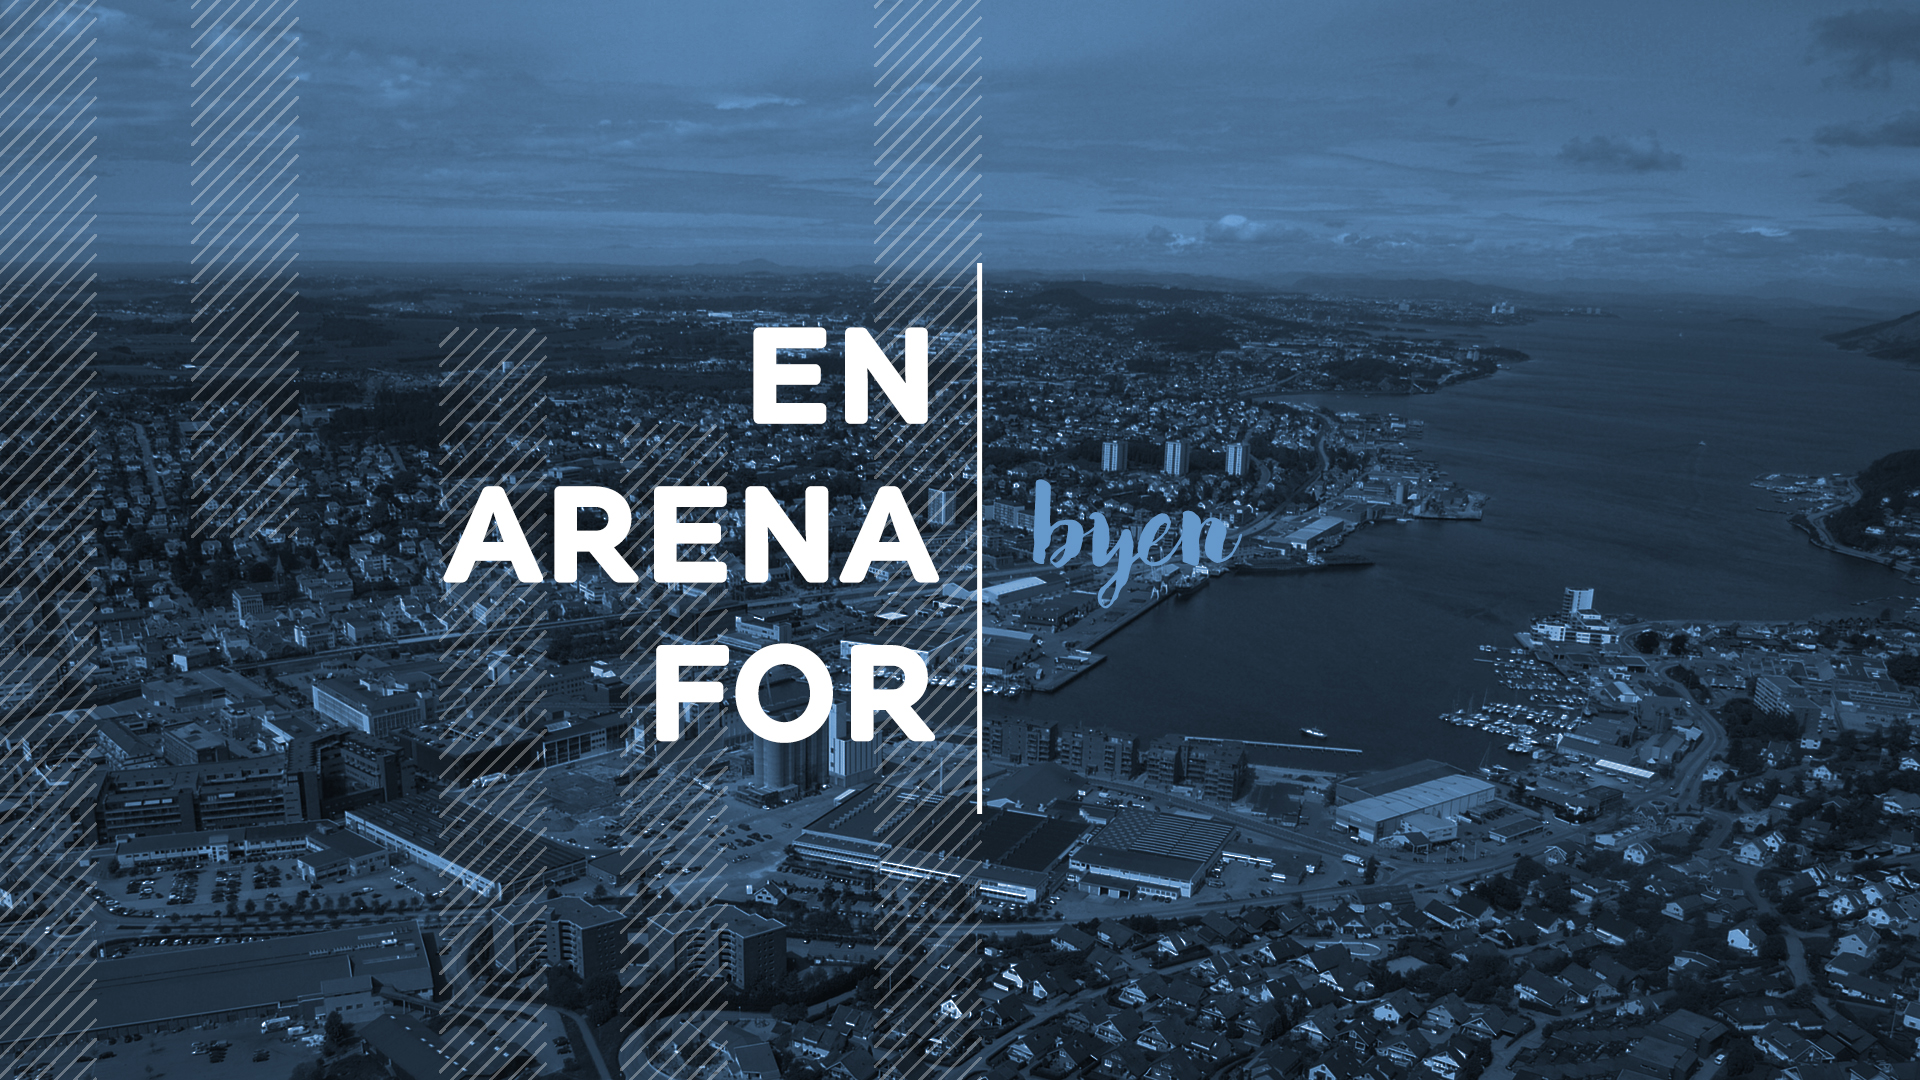 En arena for byen, G1